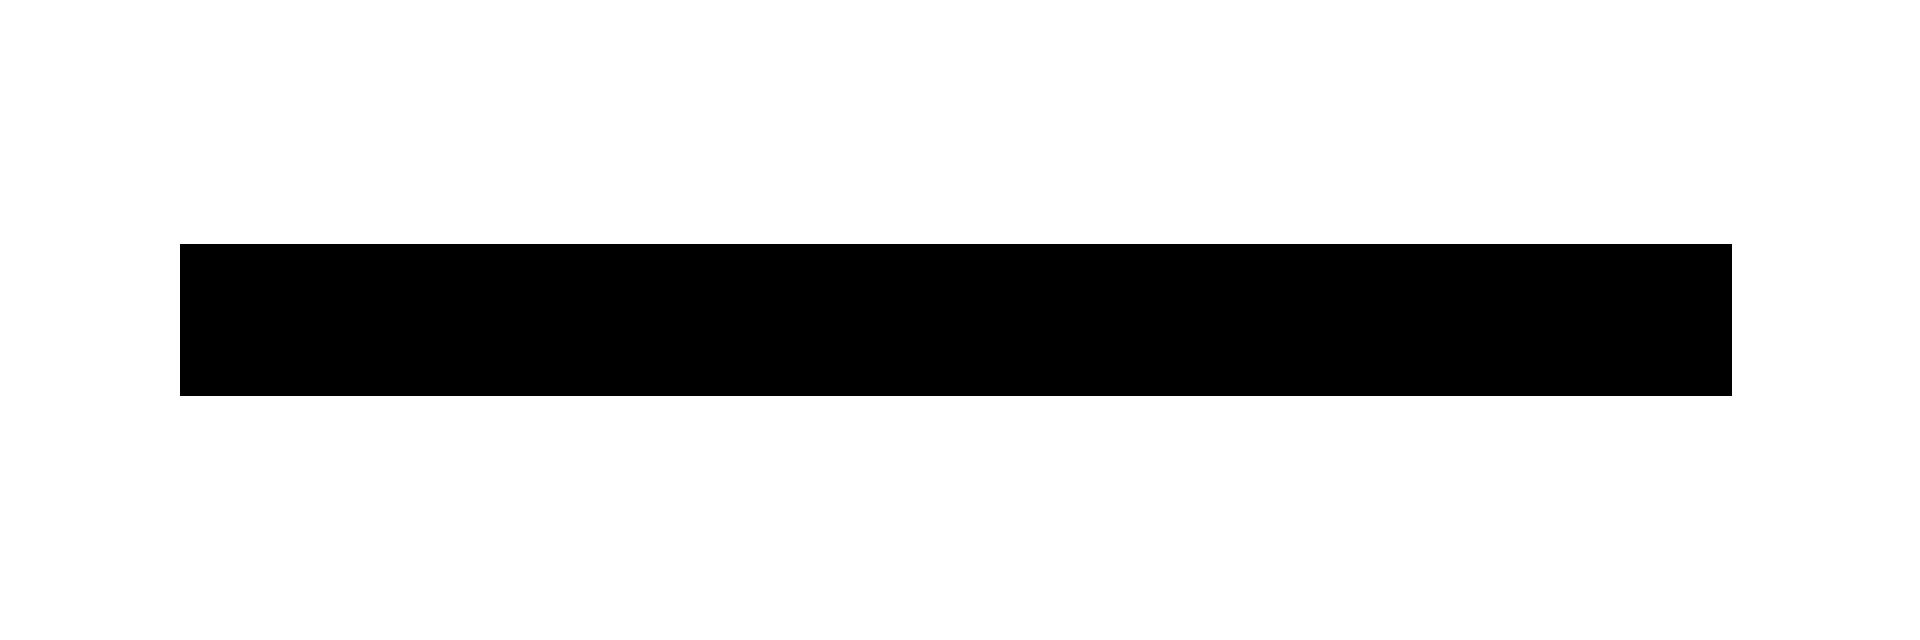 Nishiki logo